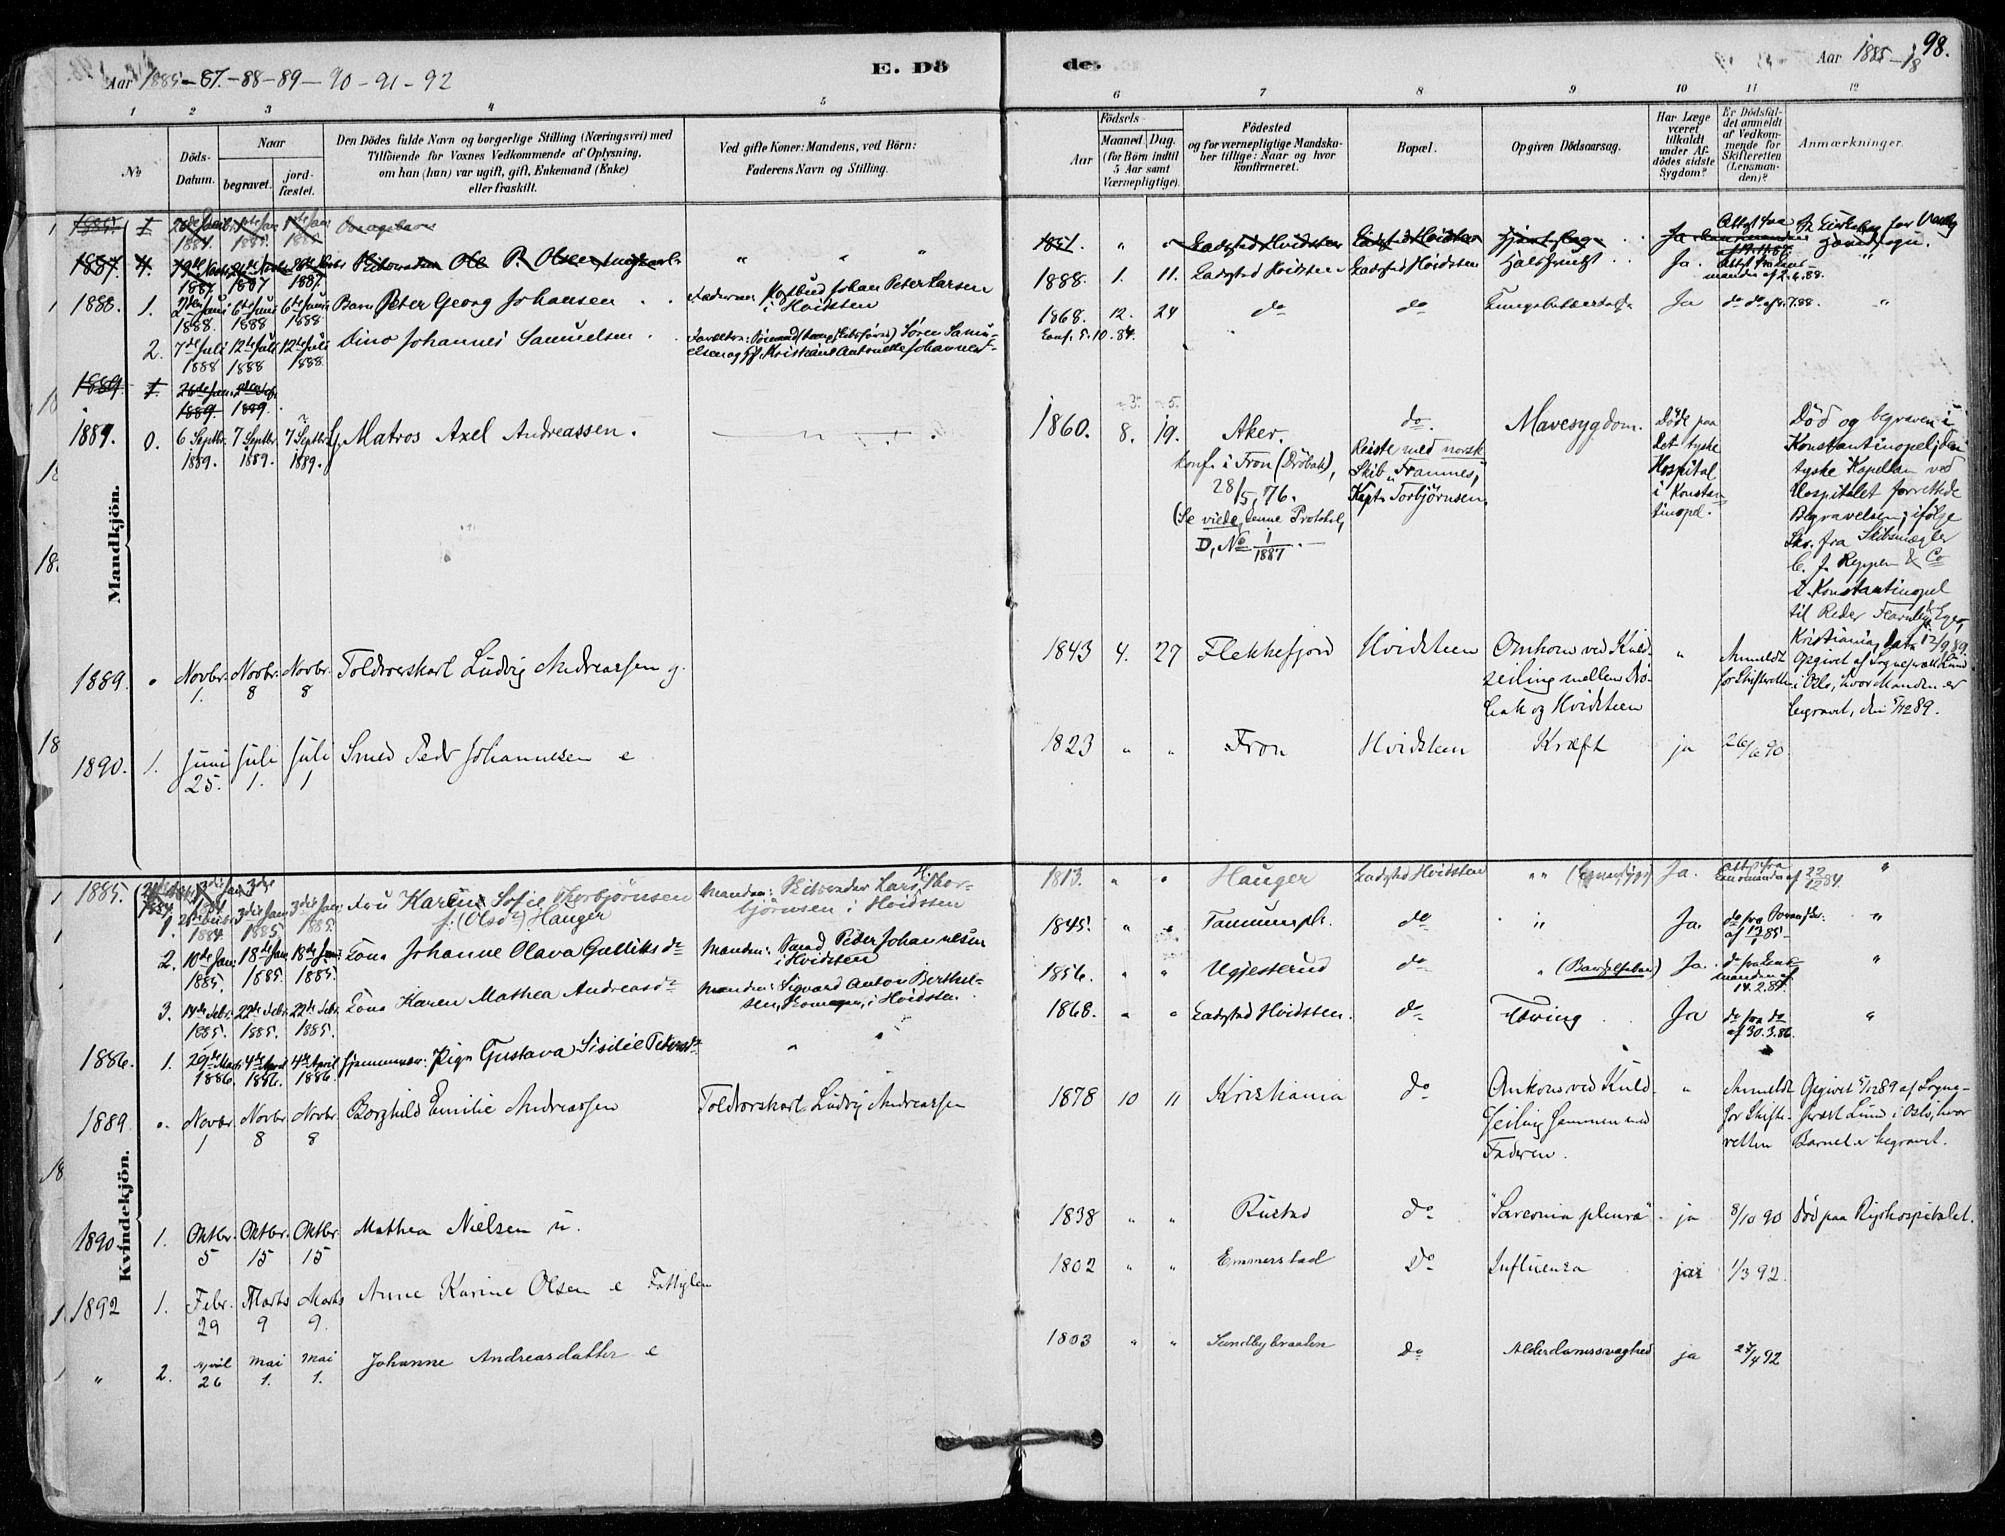 SAO, Vestby prestekontor Kirkebøker, F/Fd/L0001: Ministerialbok nr. IV 1, 1878-1945, s. 98